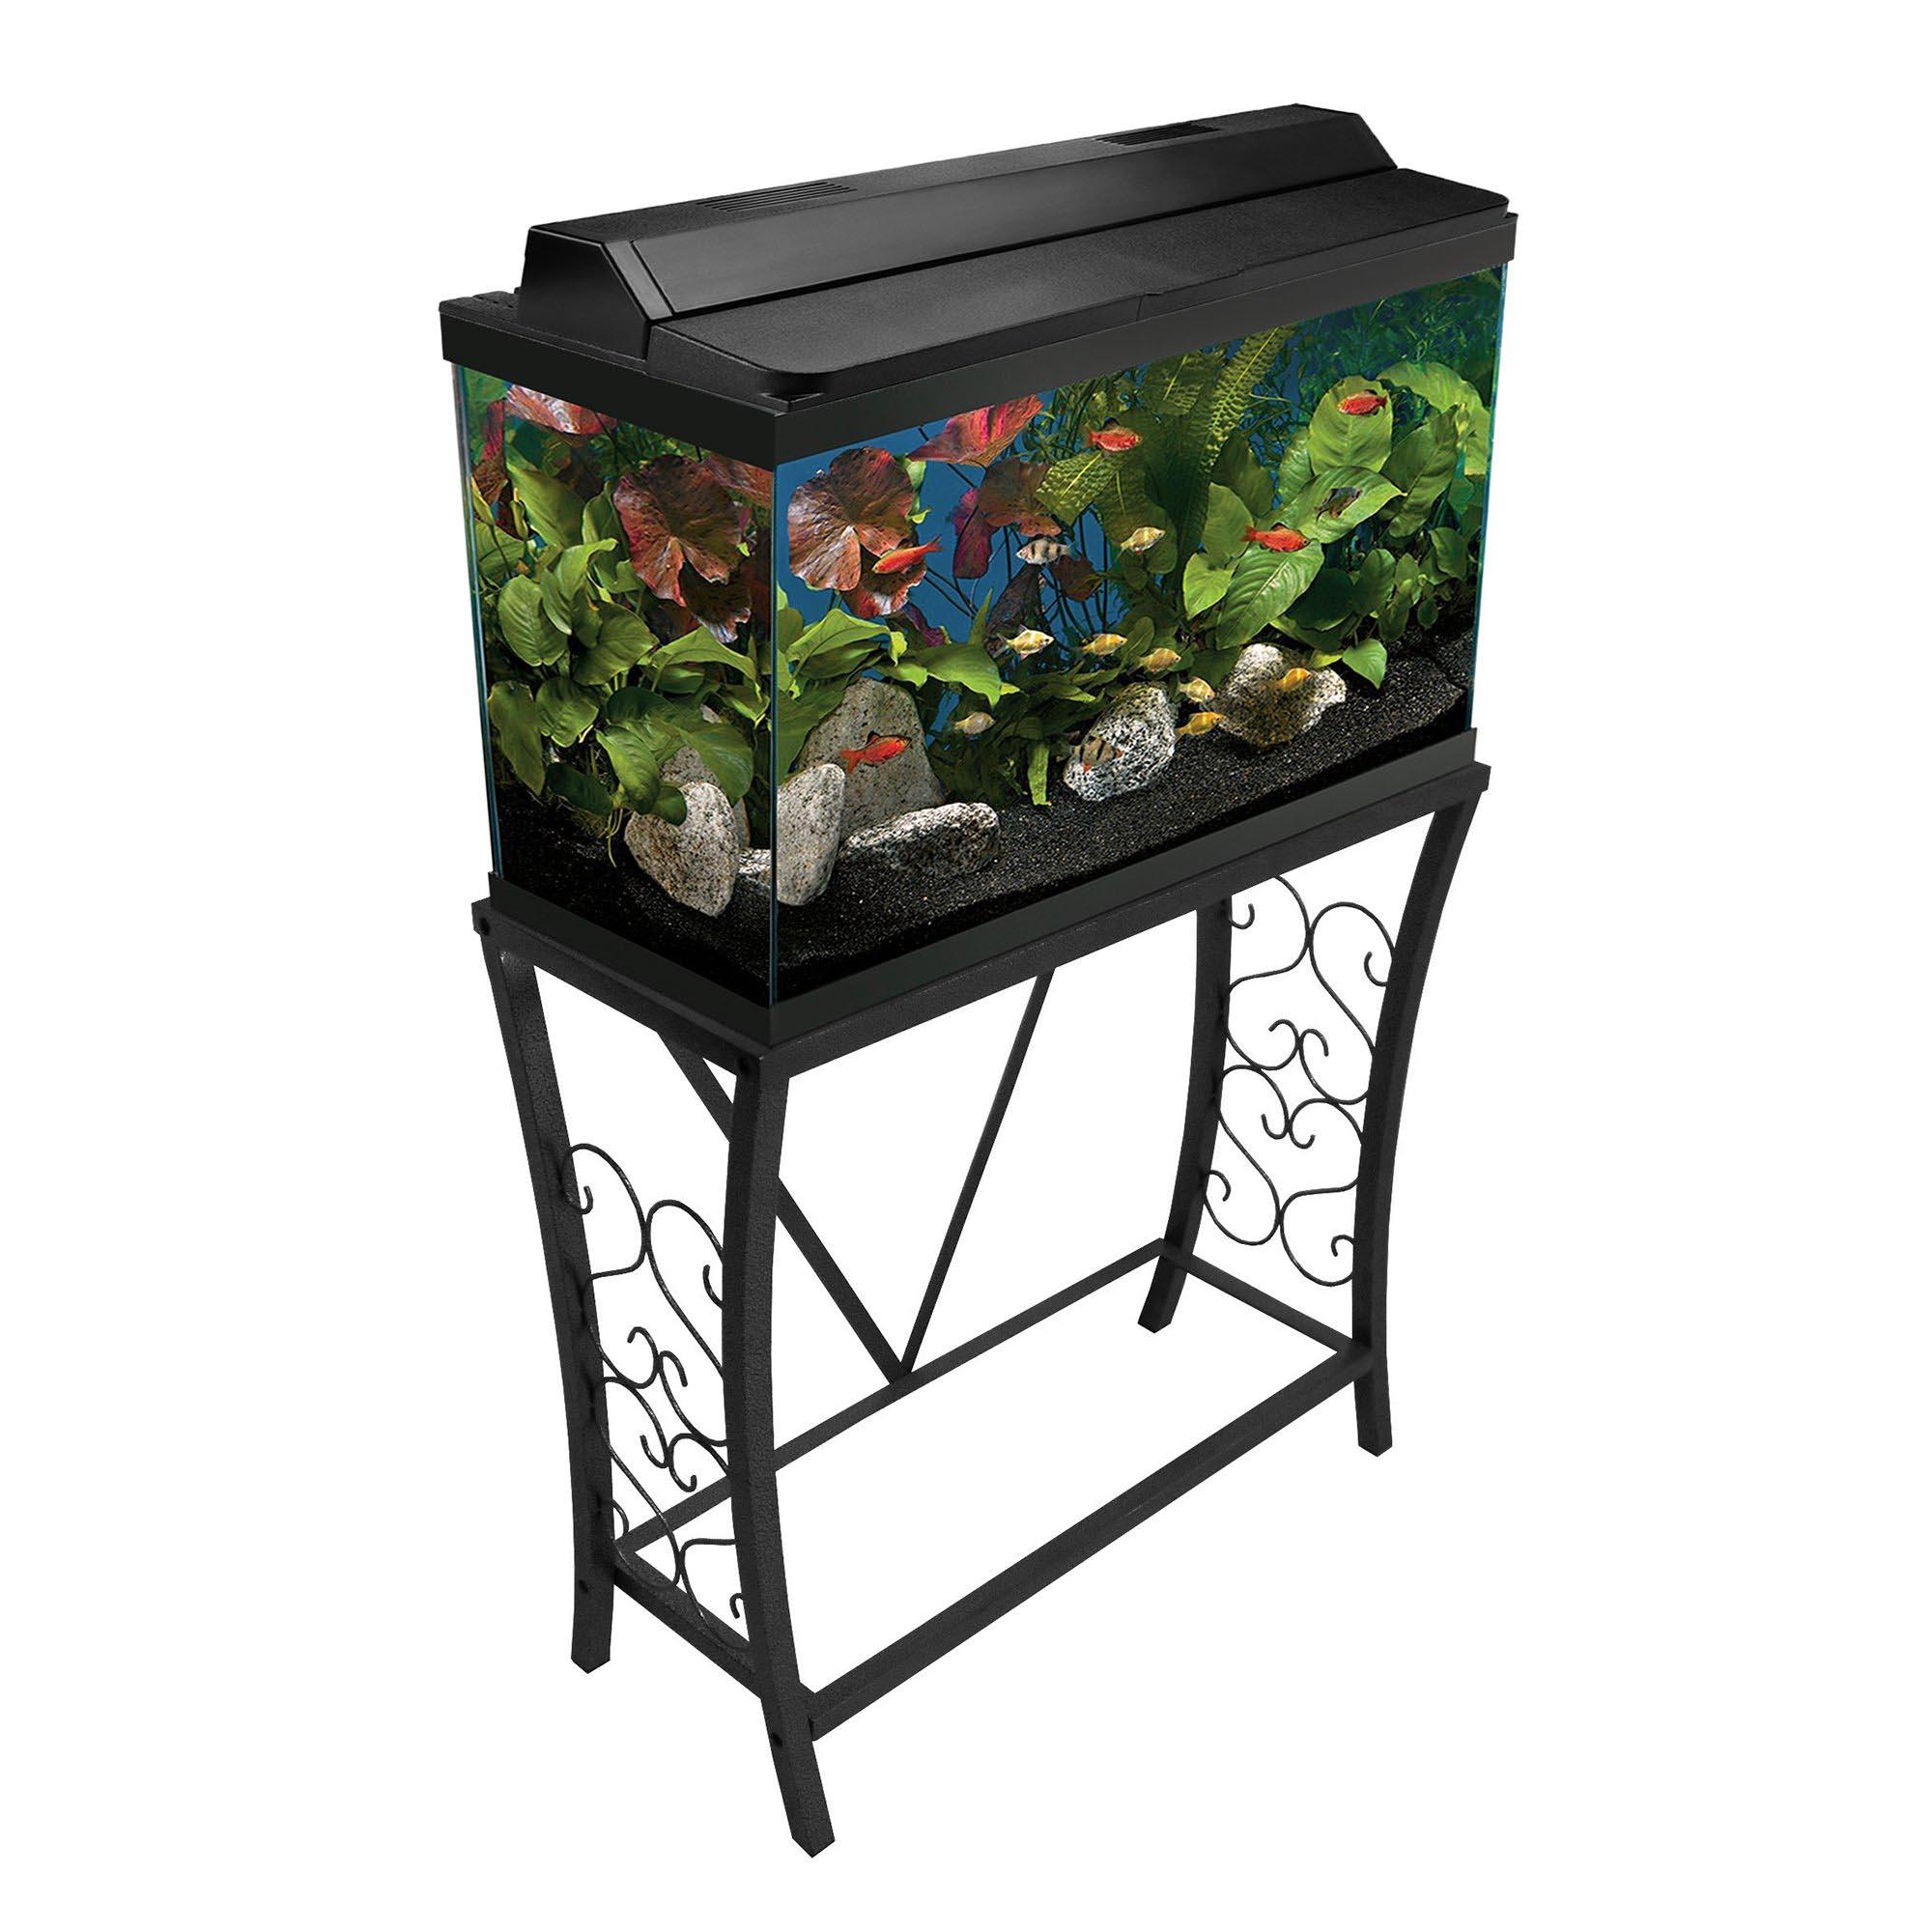 30 gallon long aquarium specifics aquarium design ideas for Cheap 55 gallon fish tank